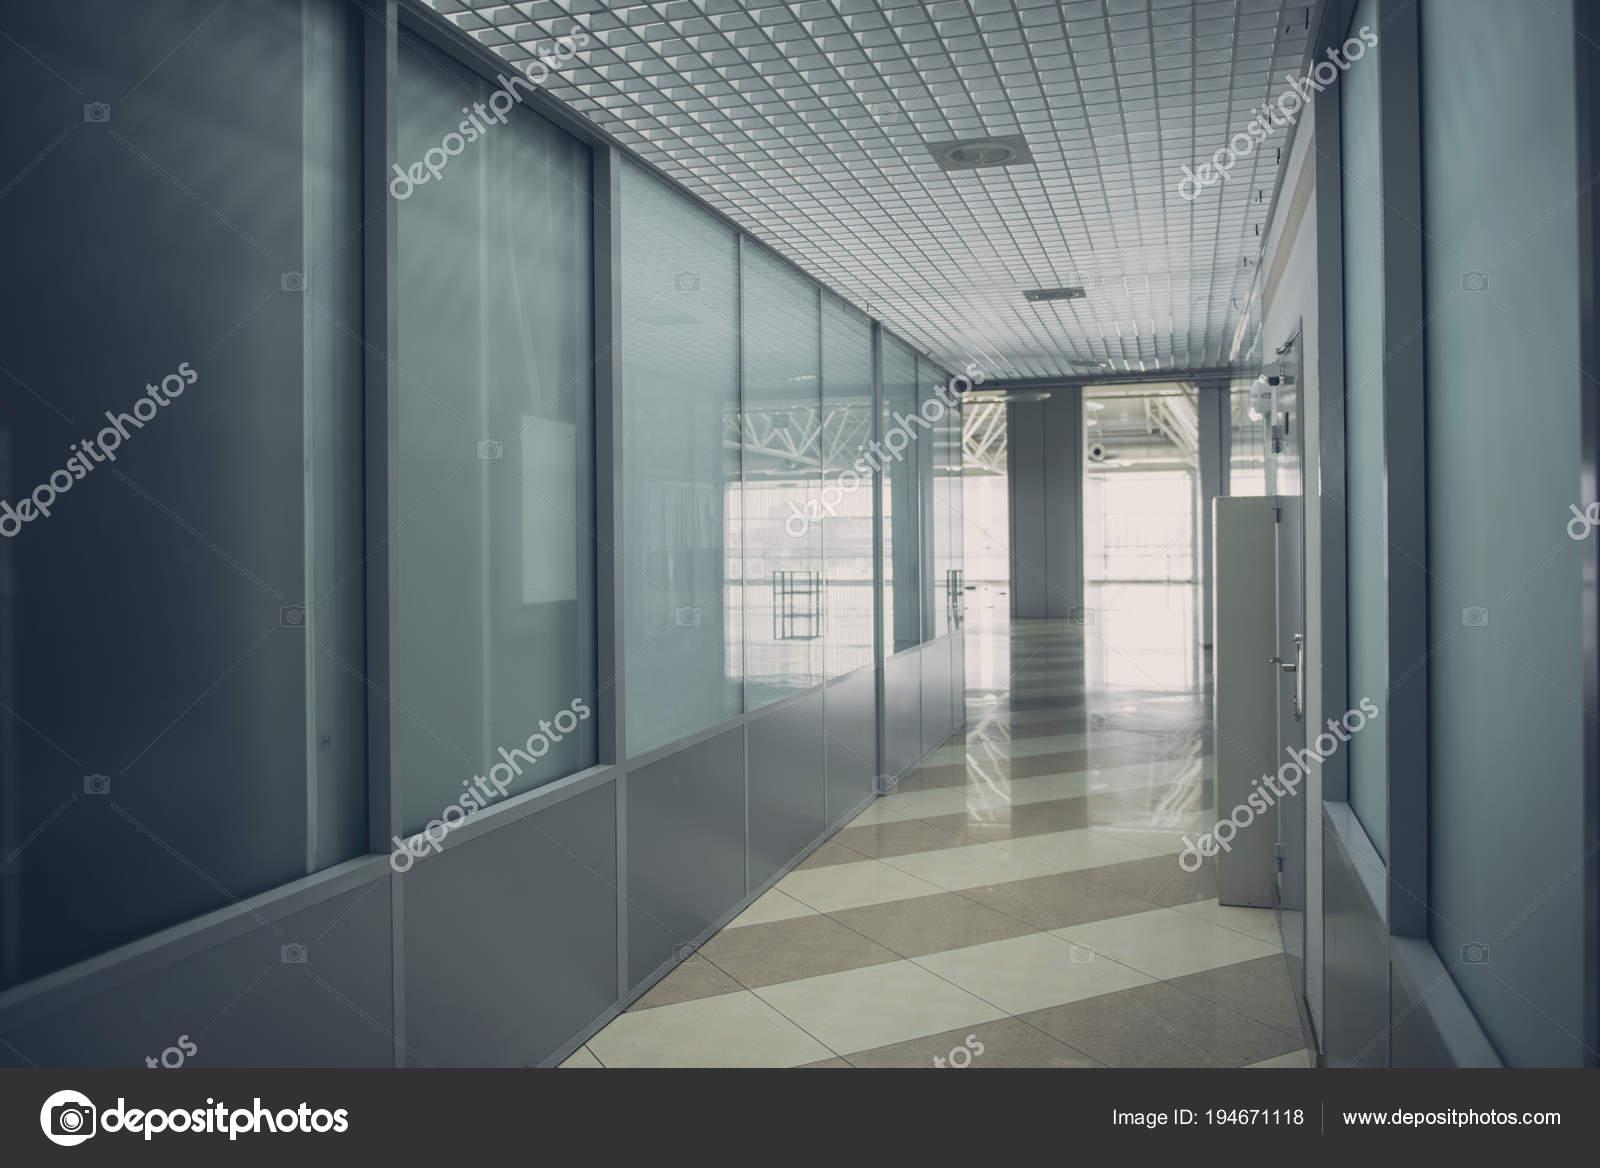 Lange gang met glazen wanden u2014 stockfoto © iakovenko123 #194671118